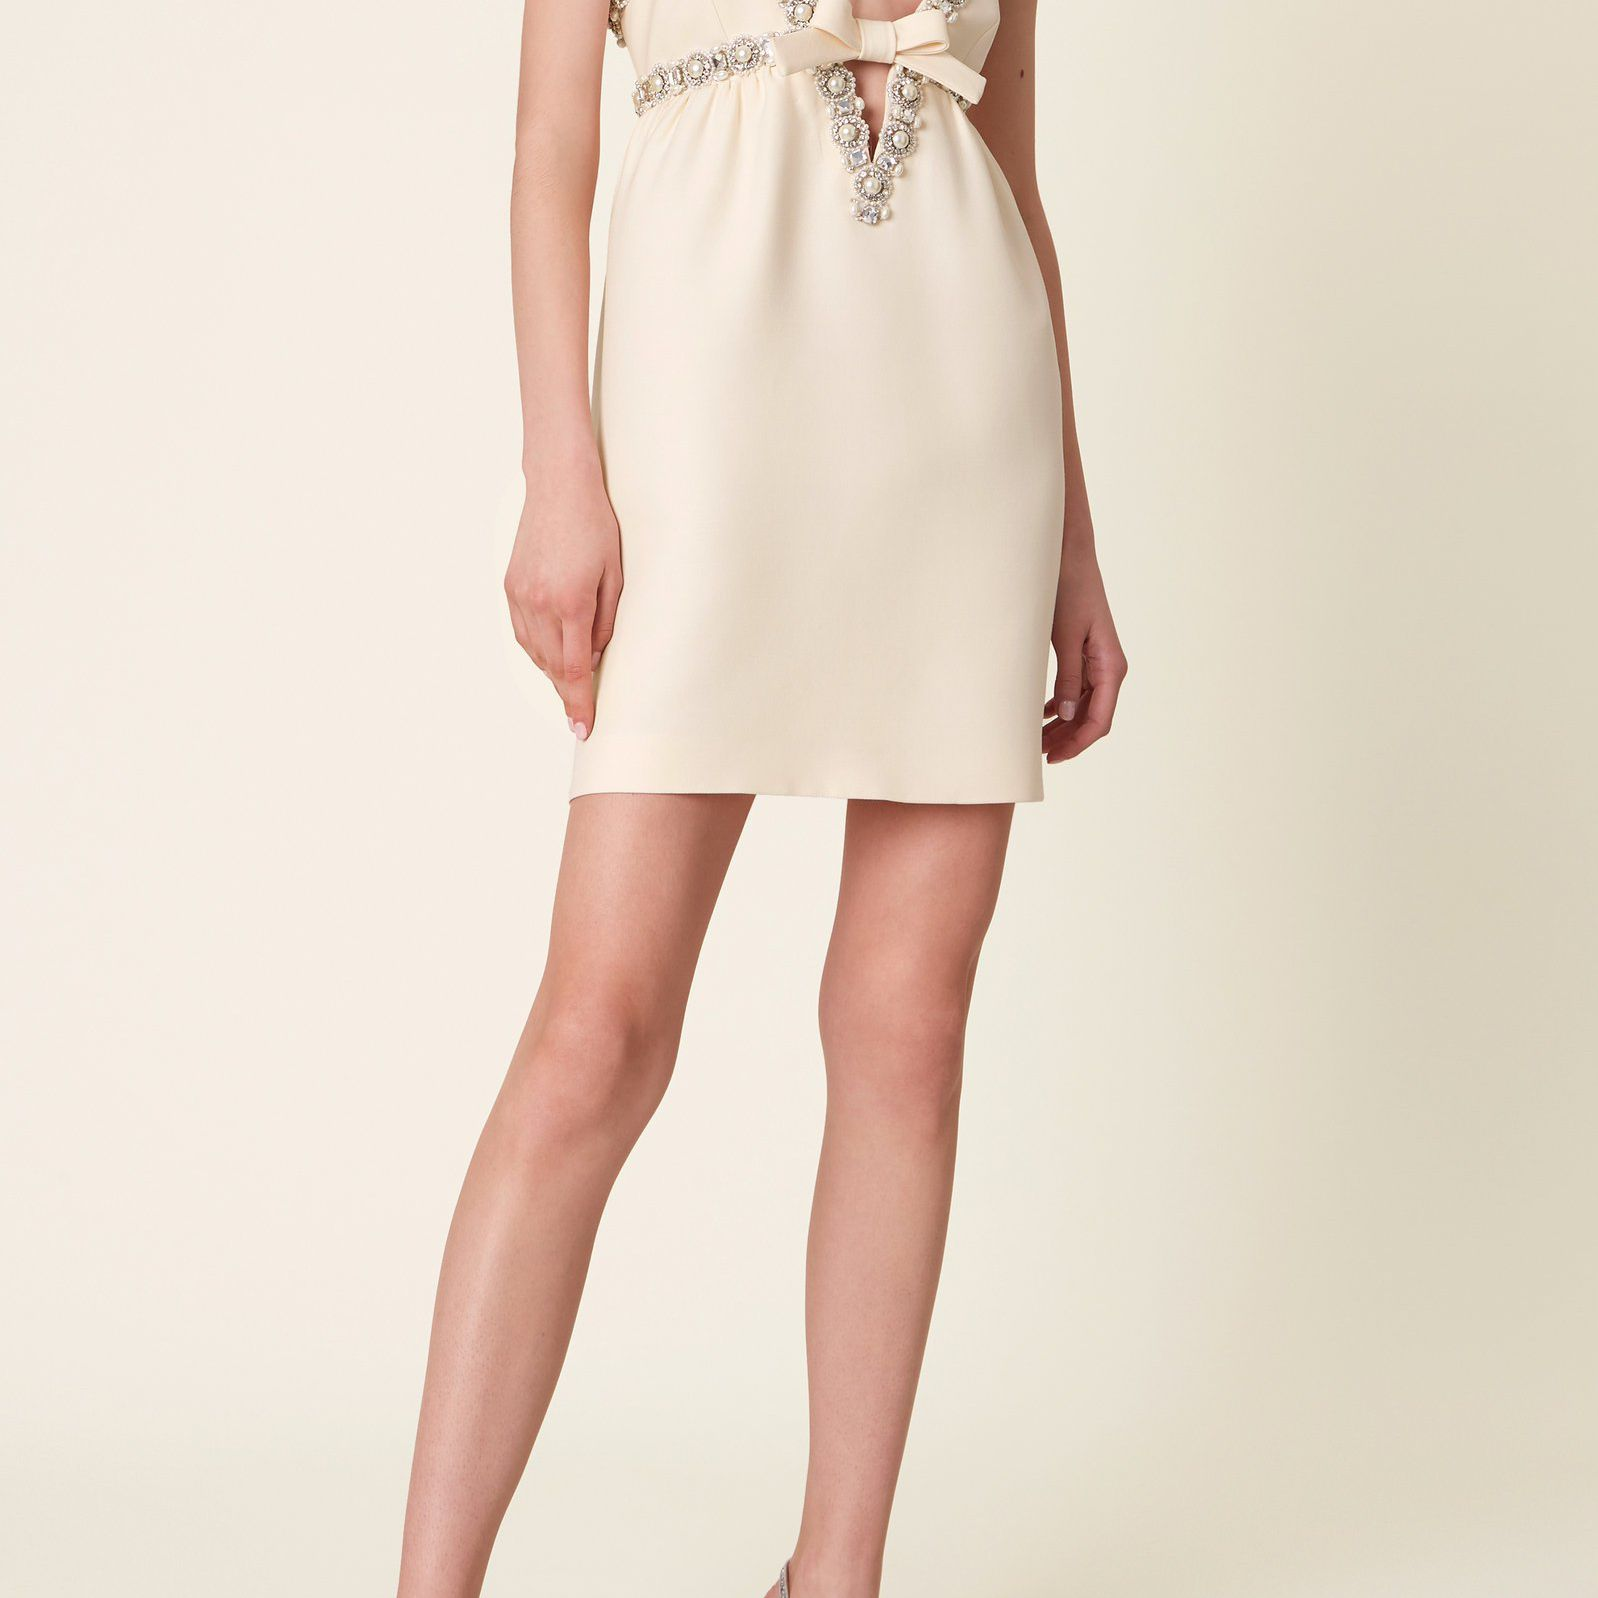 Miu Miu Pearl and Crystal Embellished Crepe Mini Dress